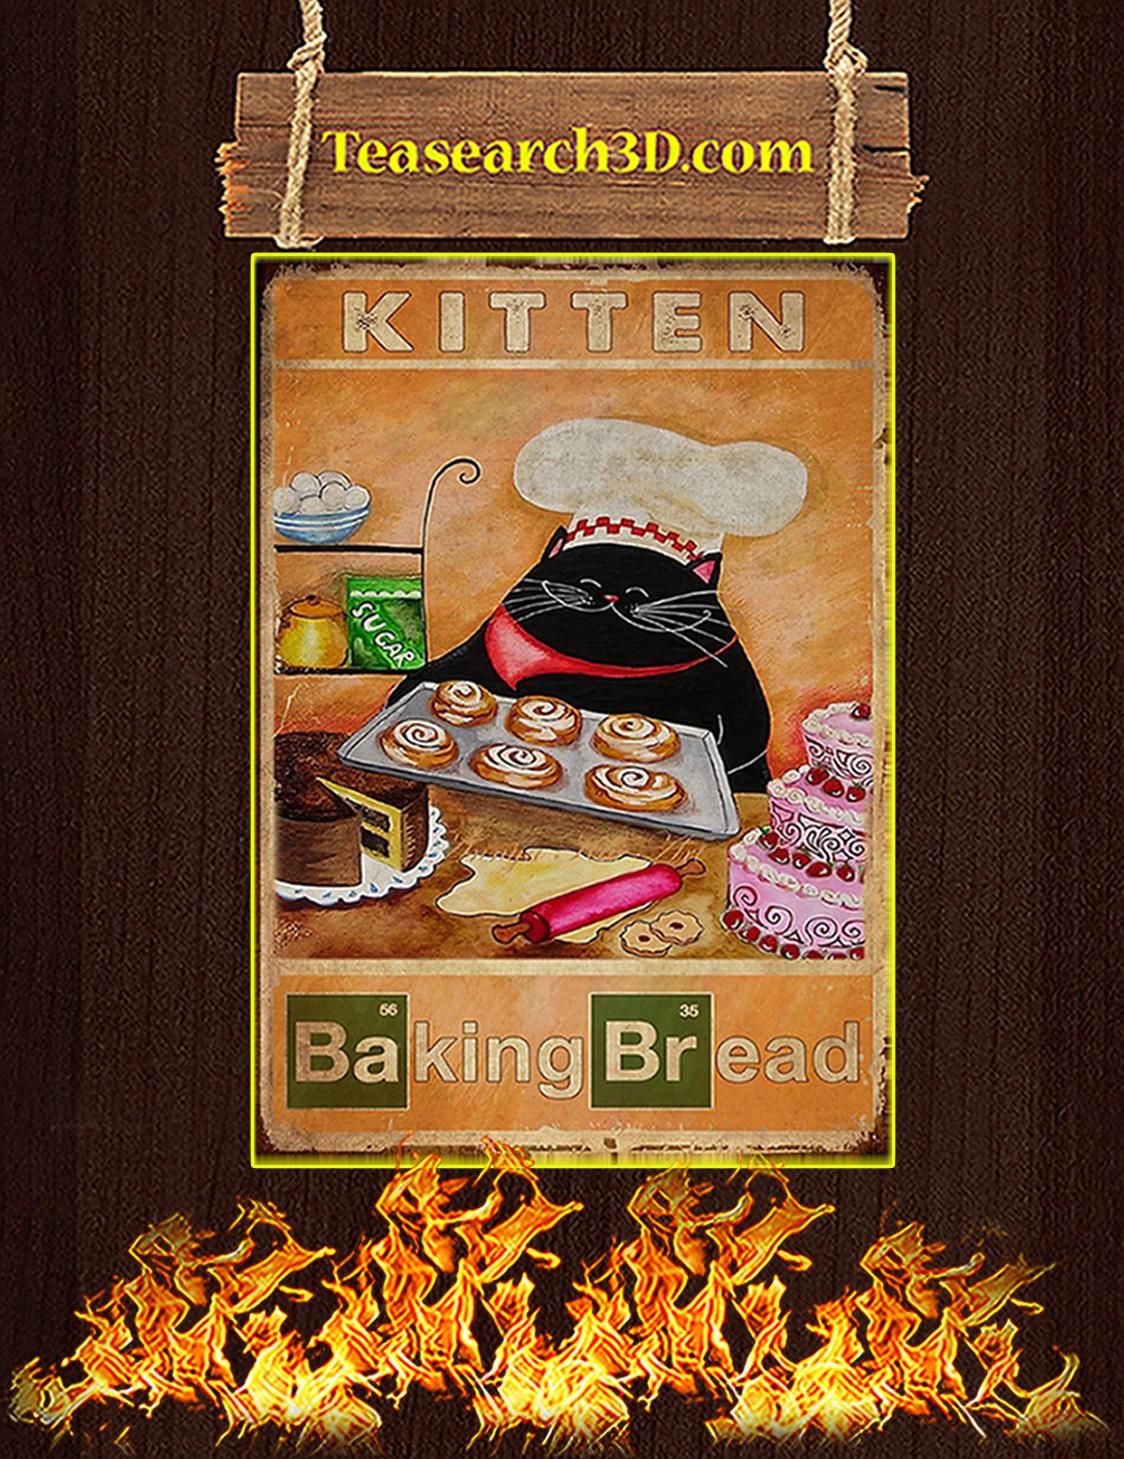 Kitten baking bread poster A3